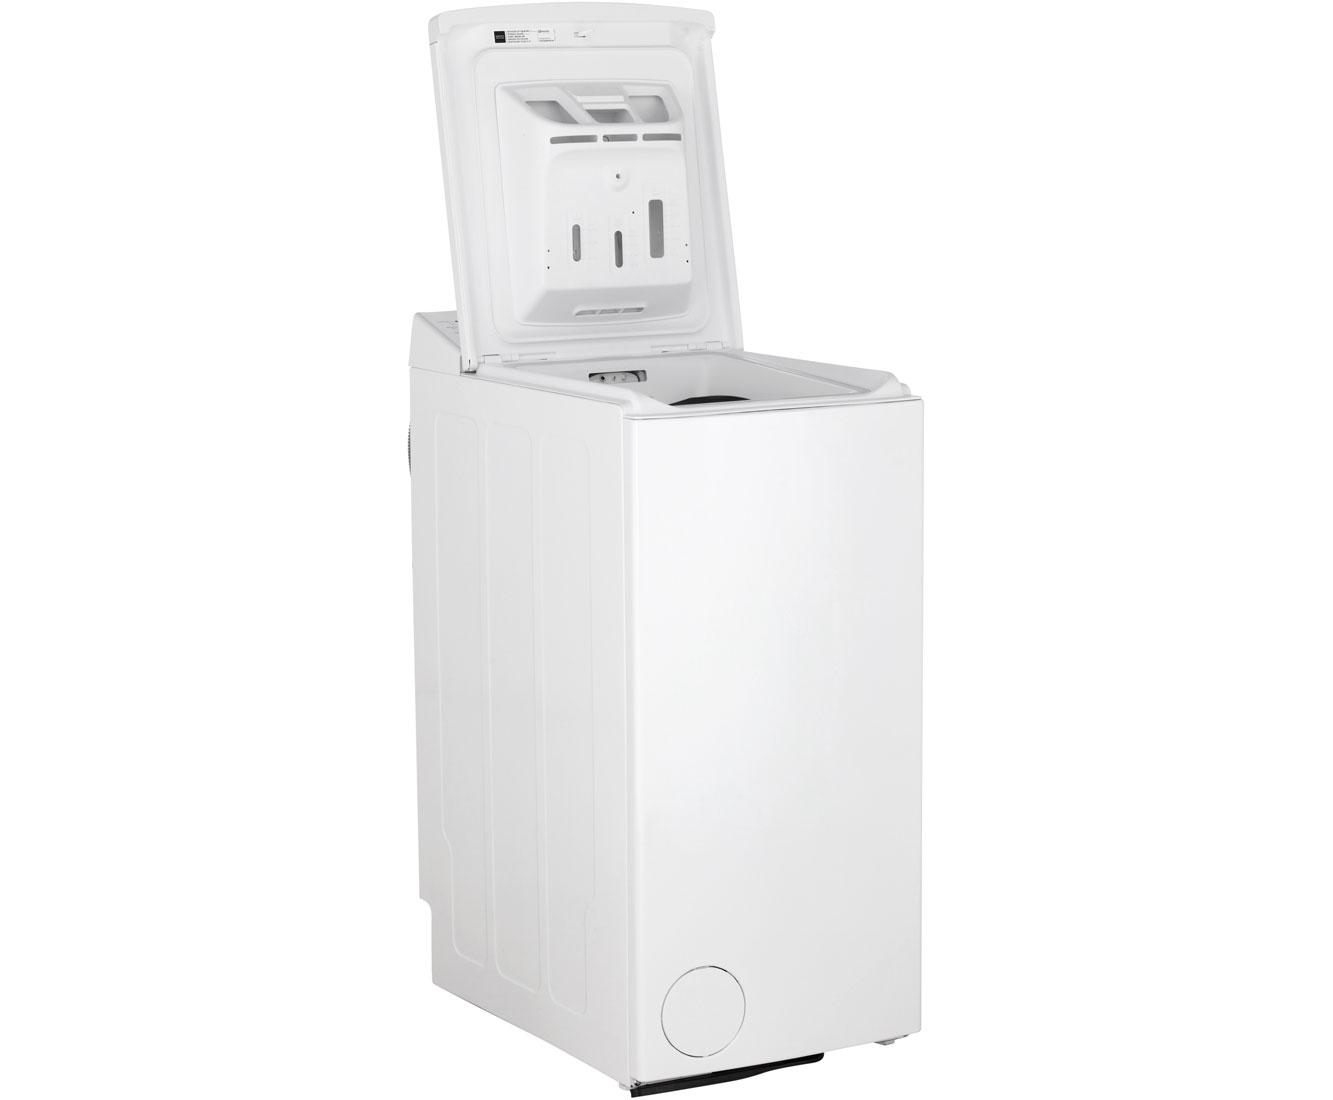 Bauknecht wat prime 752 di waschmaschine toplader 7 kg 1200 u min